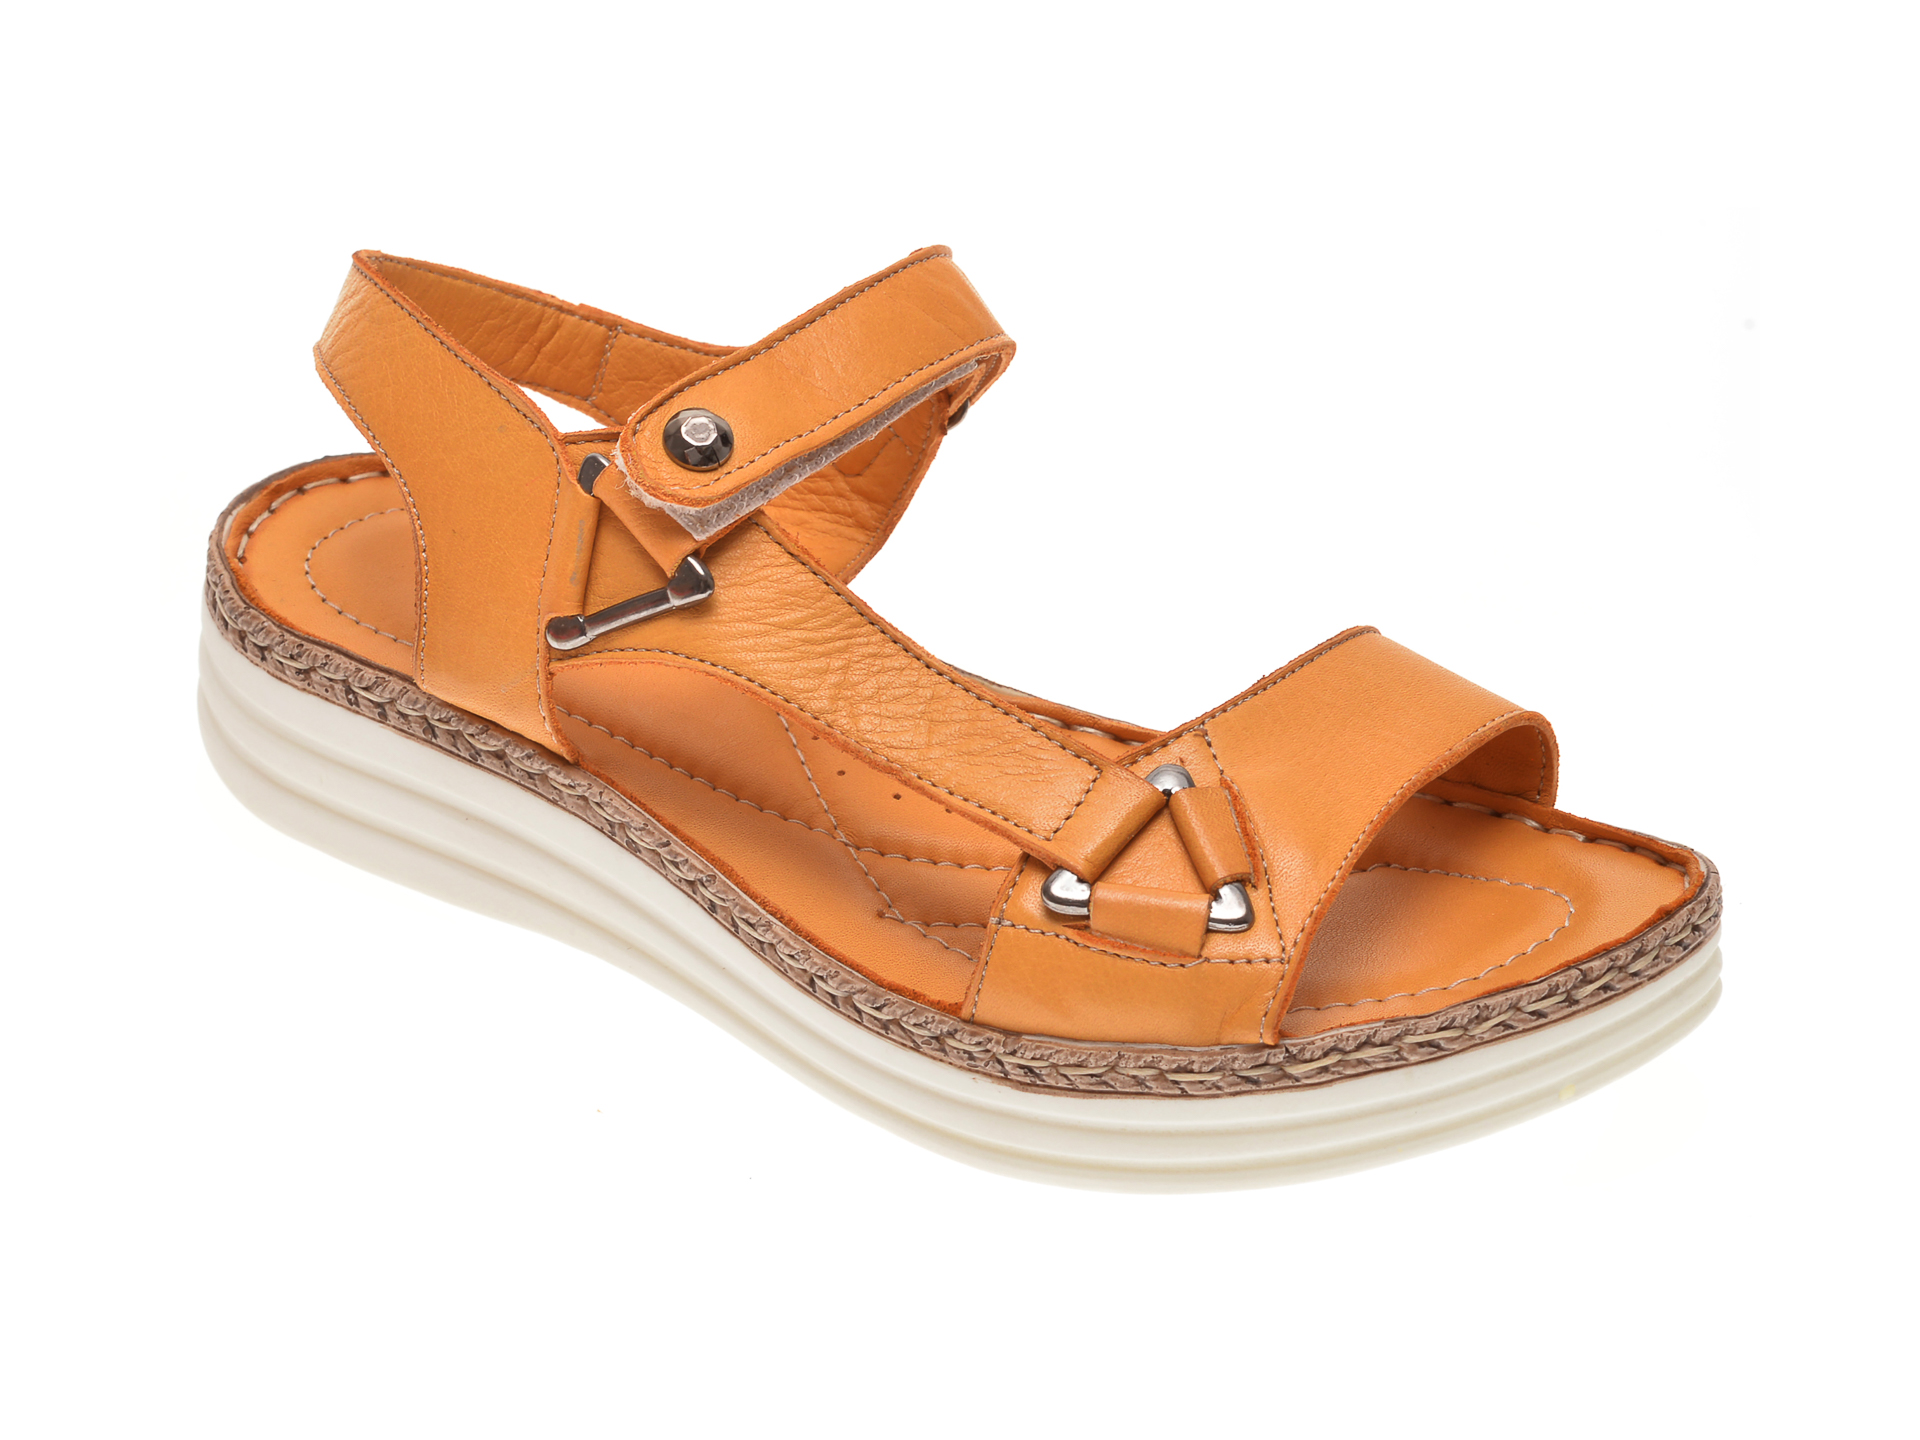 Sandale X TREND galbene, 513, din piele naturala imagine